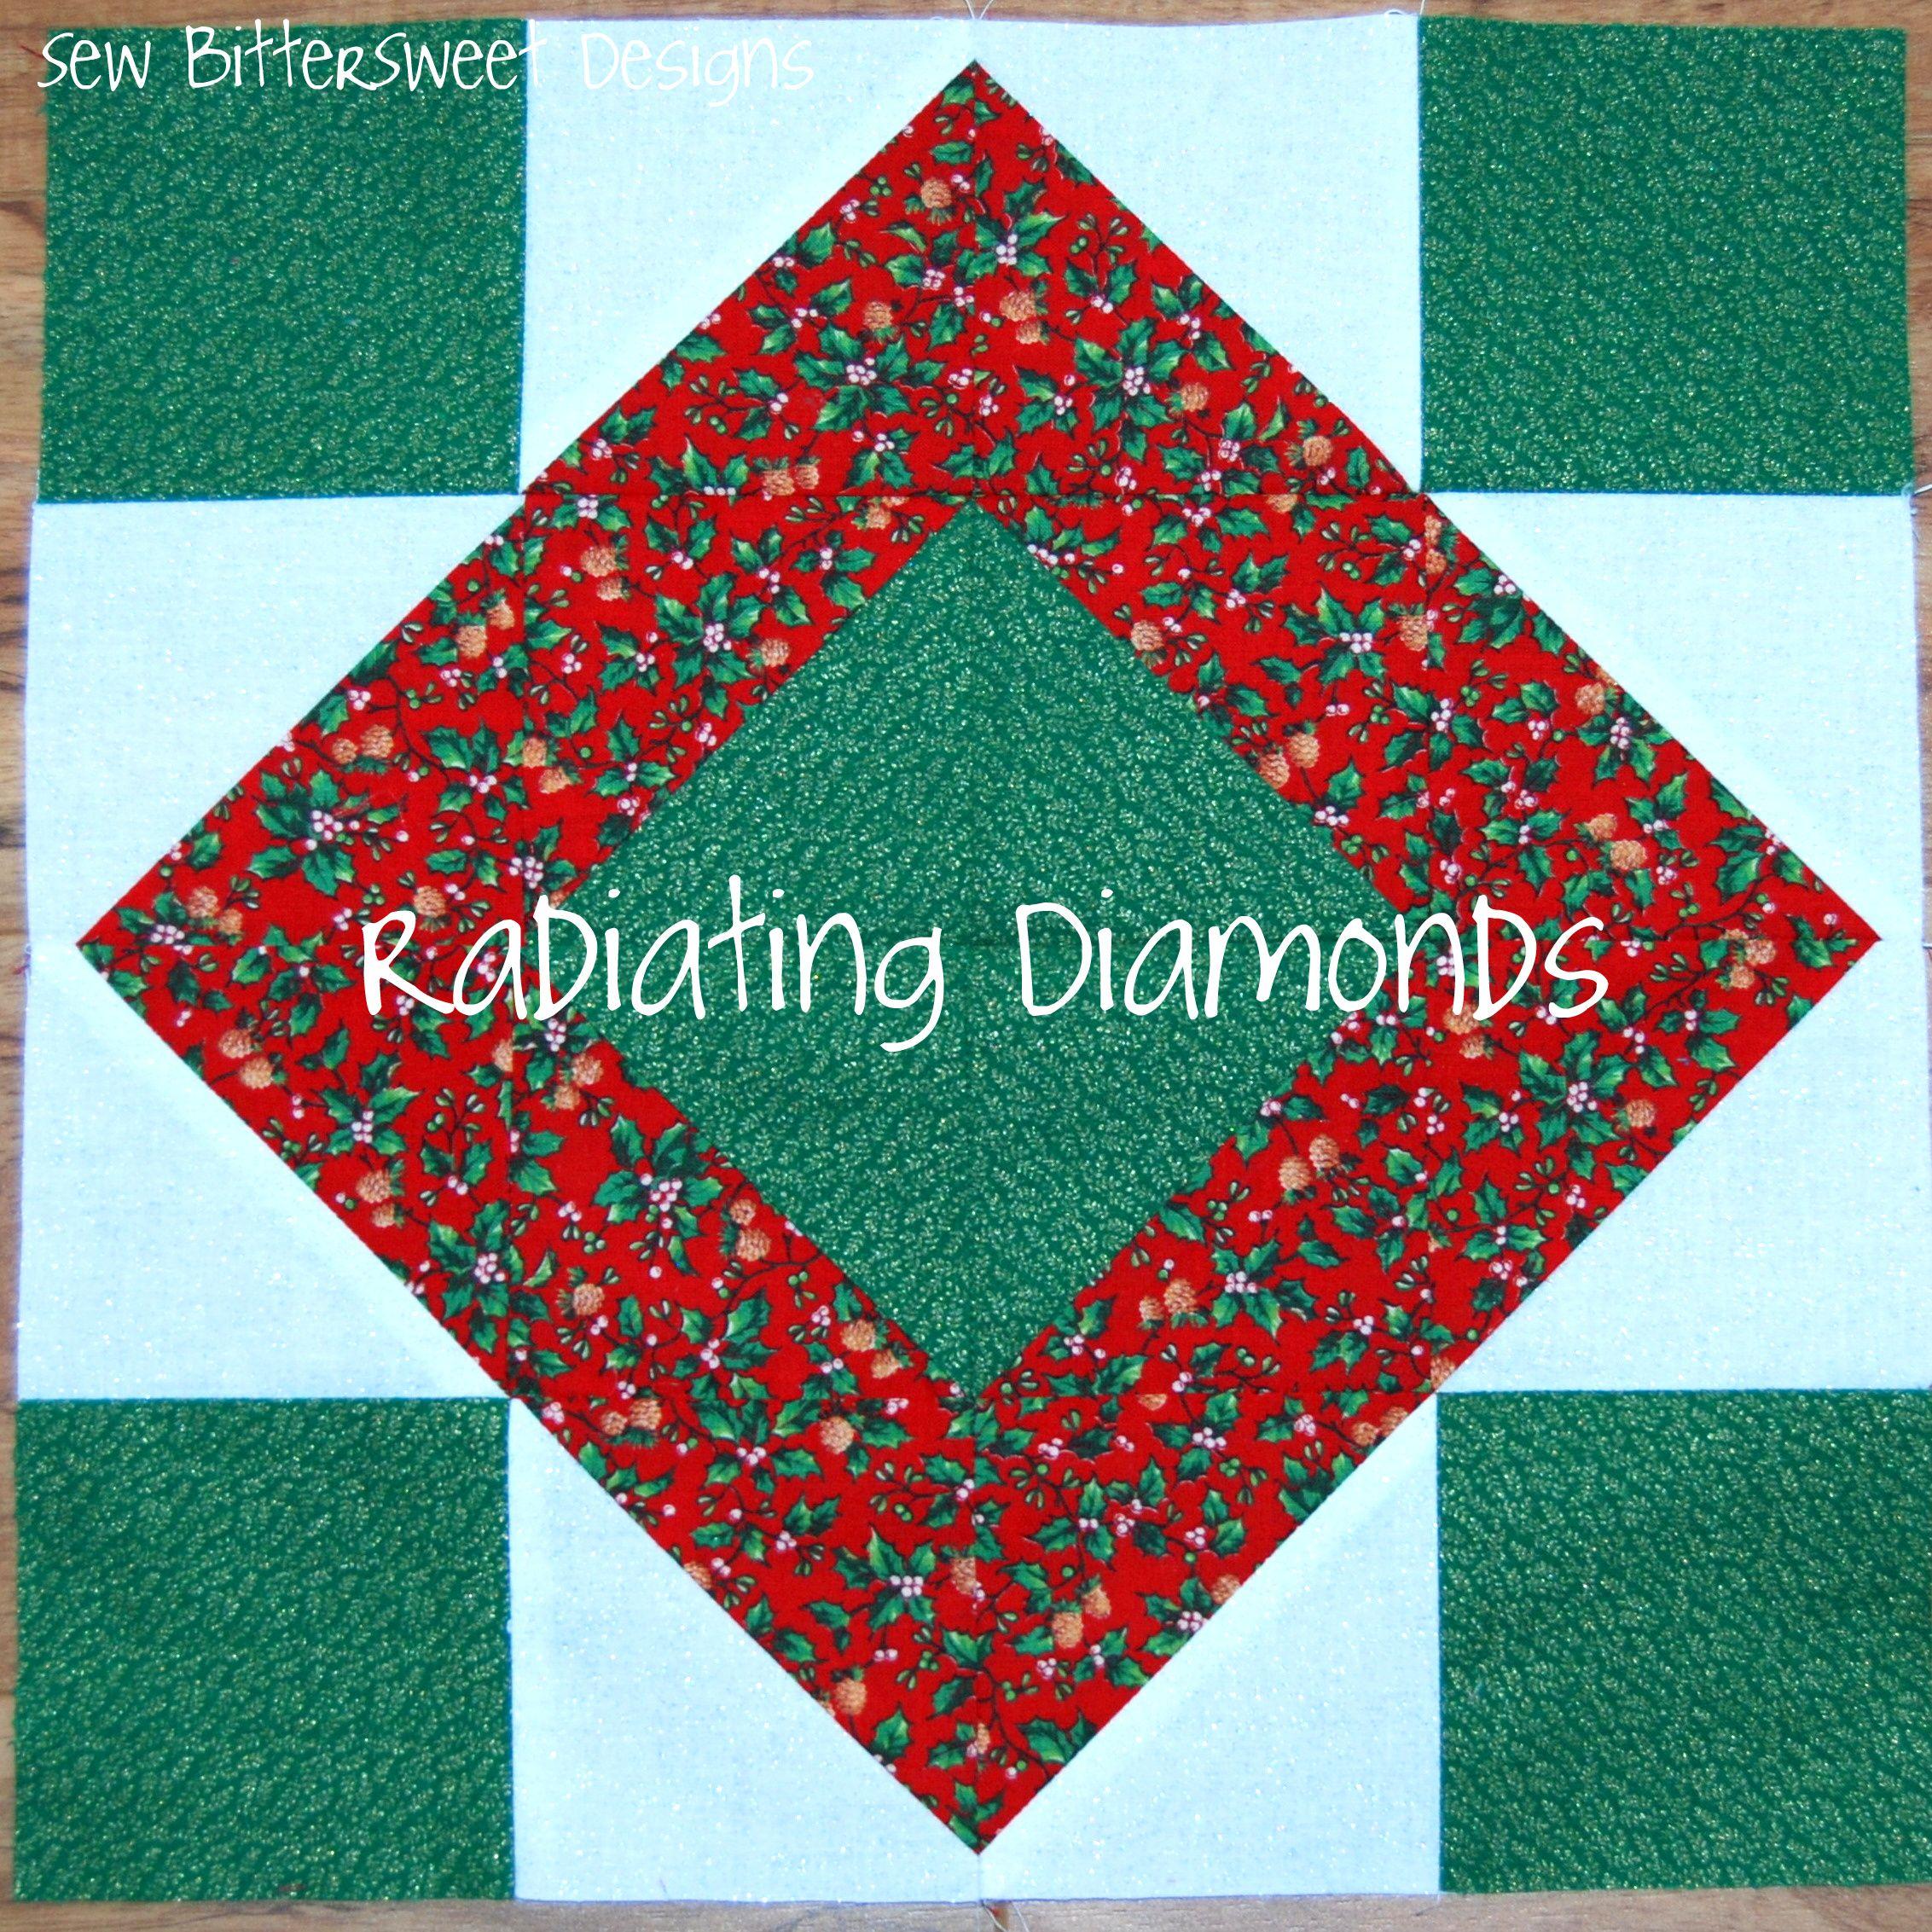 Radiating Diamonds Quilt Block Tutorial - Sew BitterSweet Designs ... : diamond quilt block pattern - Adamdwight.com